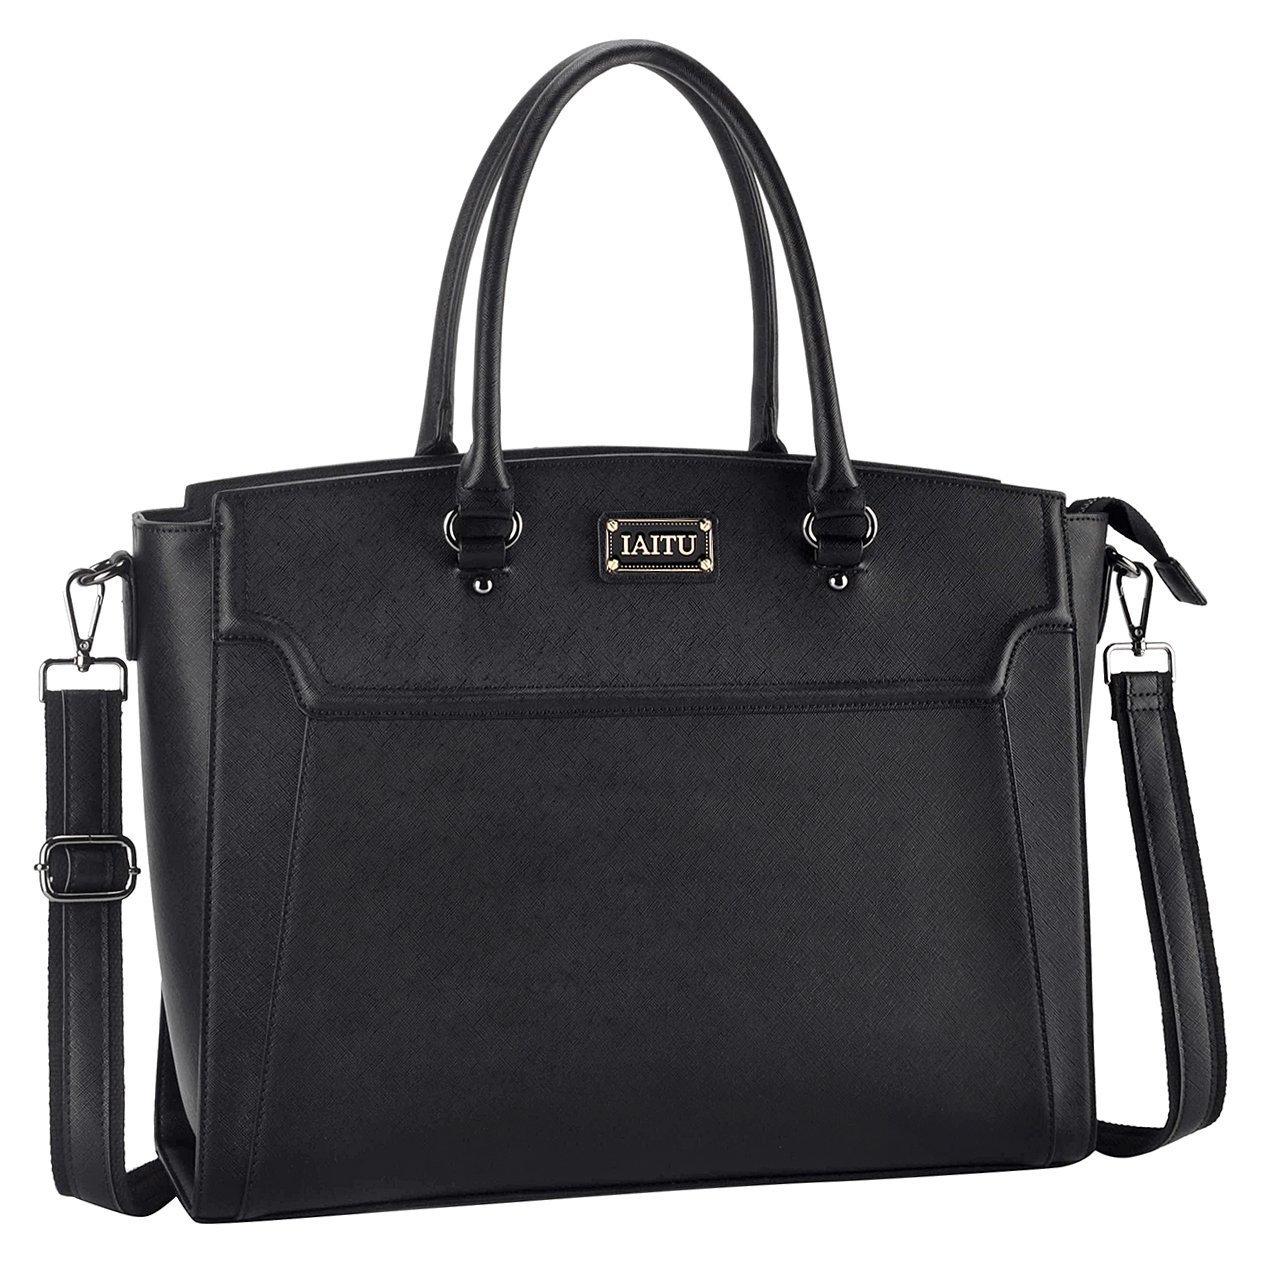 IAITU Laptop Bag for Women, 15.6 inch Classic Laptop Tote Bag Work Bag for Business with Adjustable Shoulder Strap (Black)